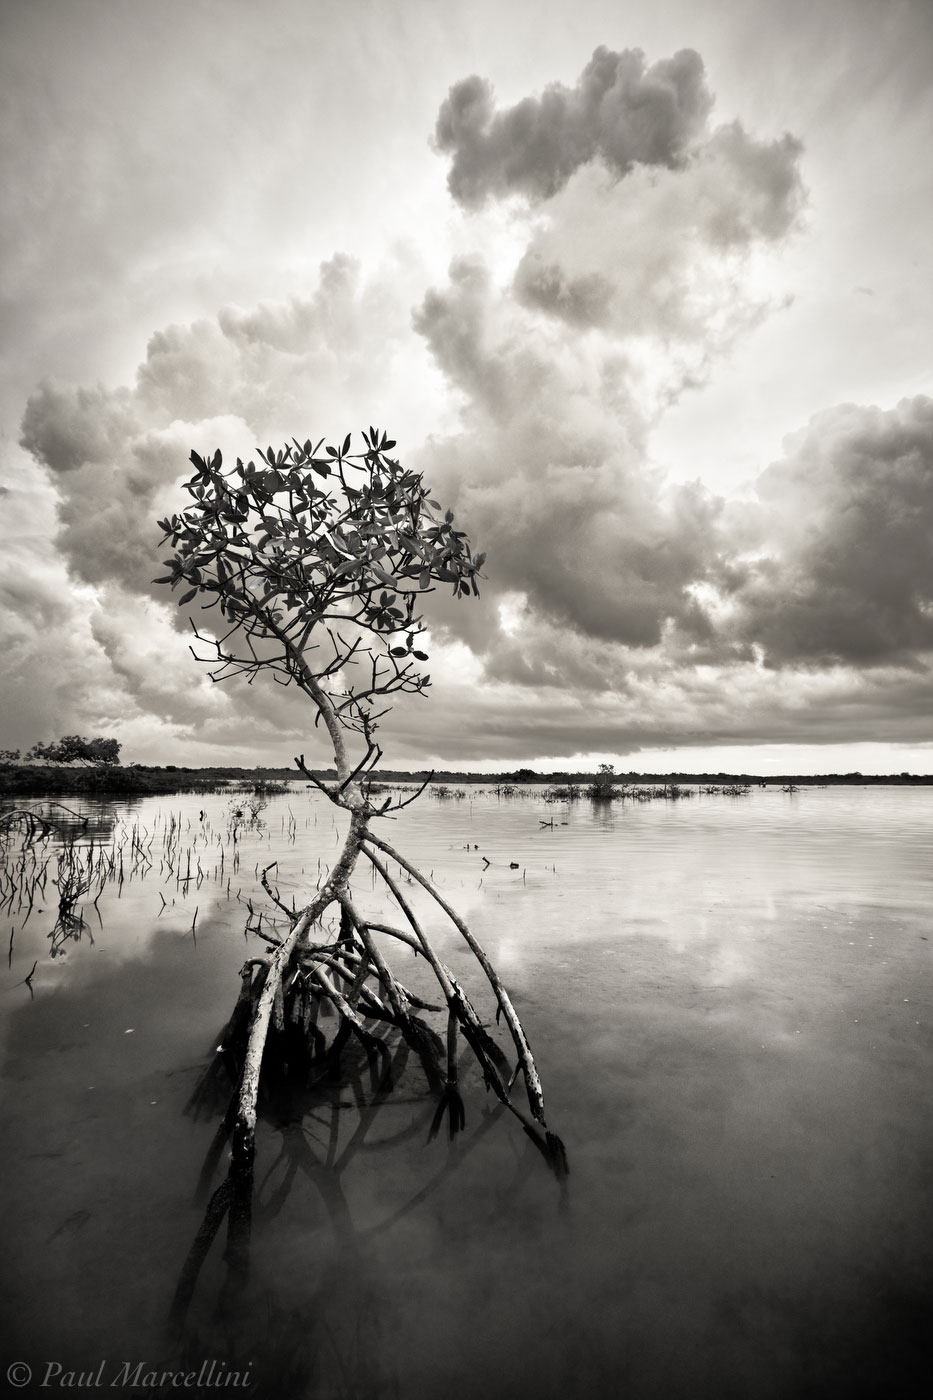 storm, mangrove, big pine key, florida keys, florida, keys, south florida, nature, photography, photo